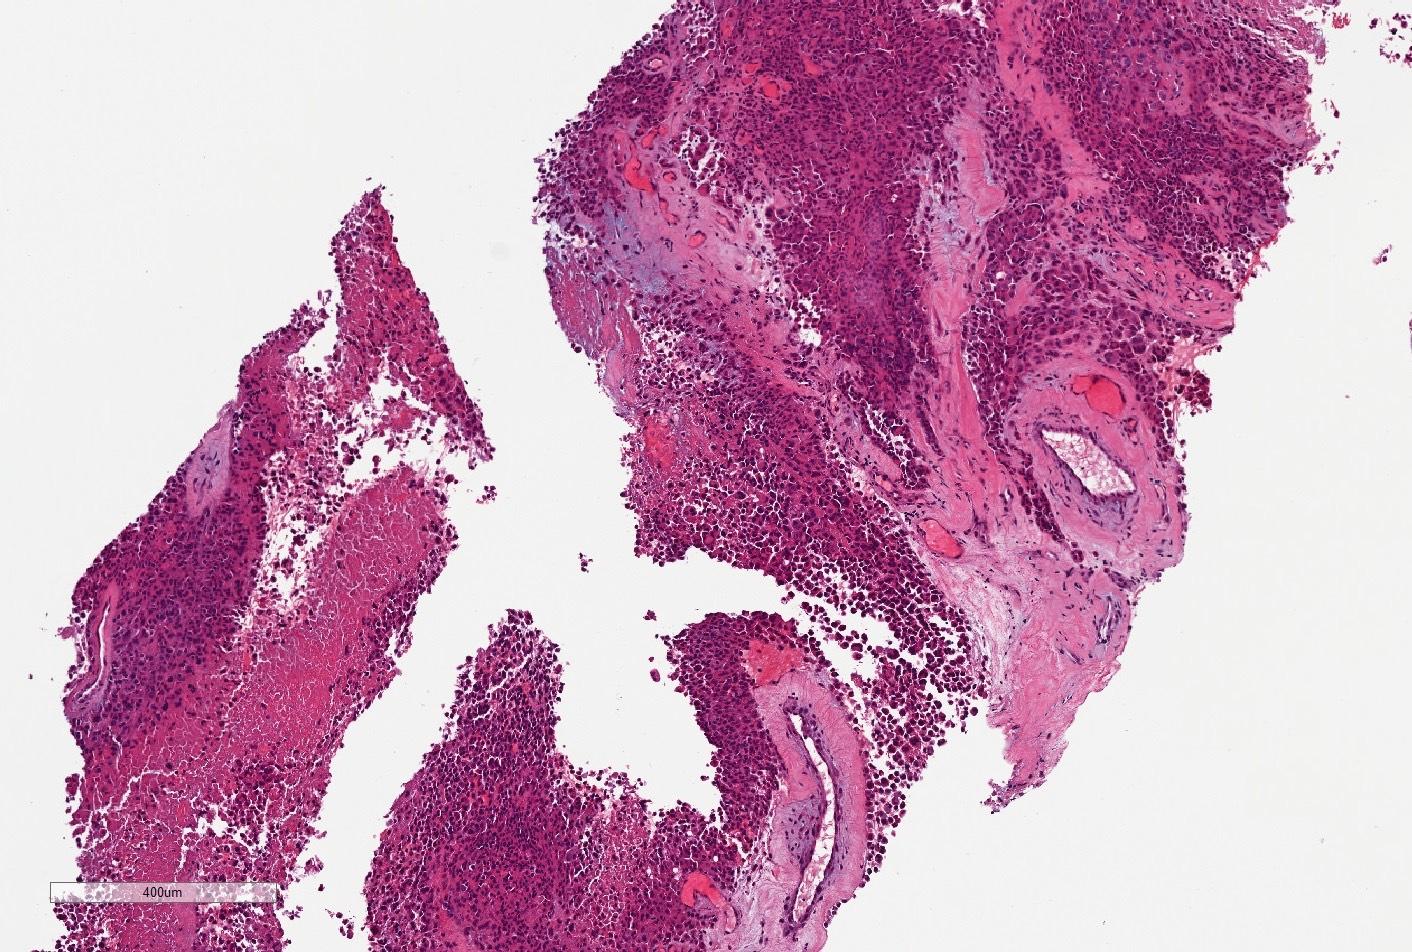 Core biopsy